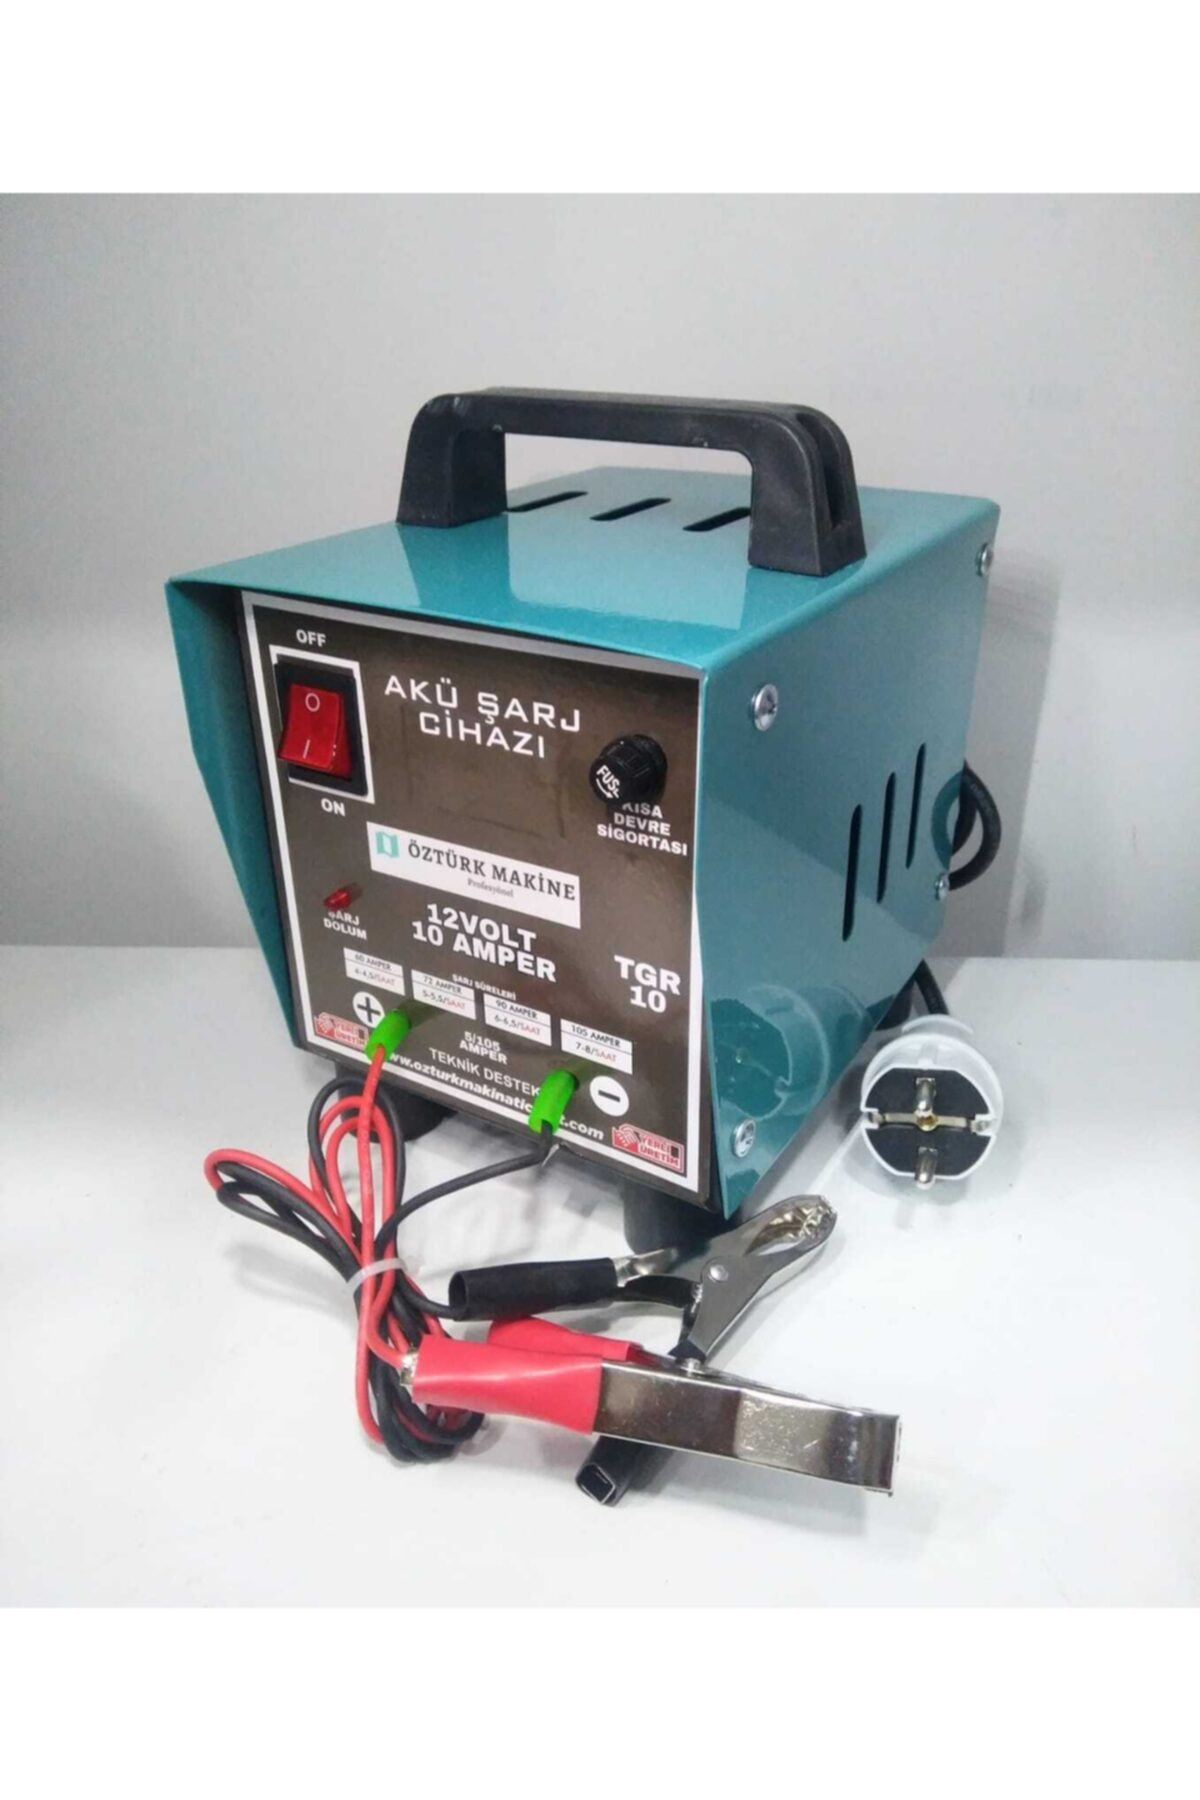 Öztürk Makine 12 V 10 Amper Akü Şarj Cihazı (1 Yıl Tam Garanti) 1